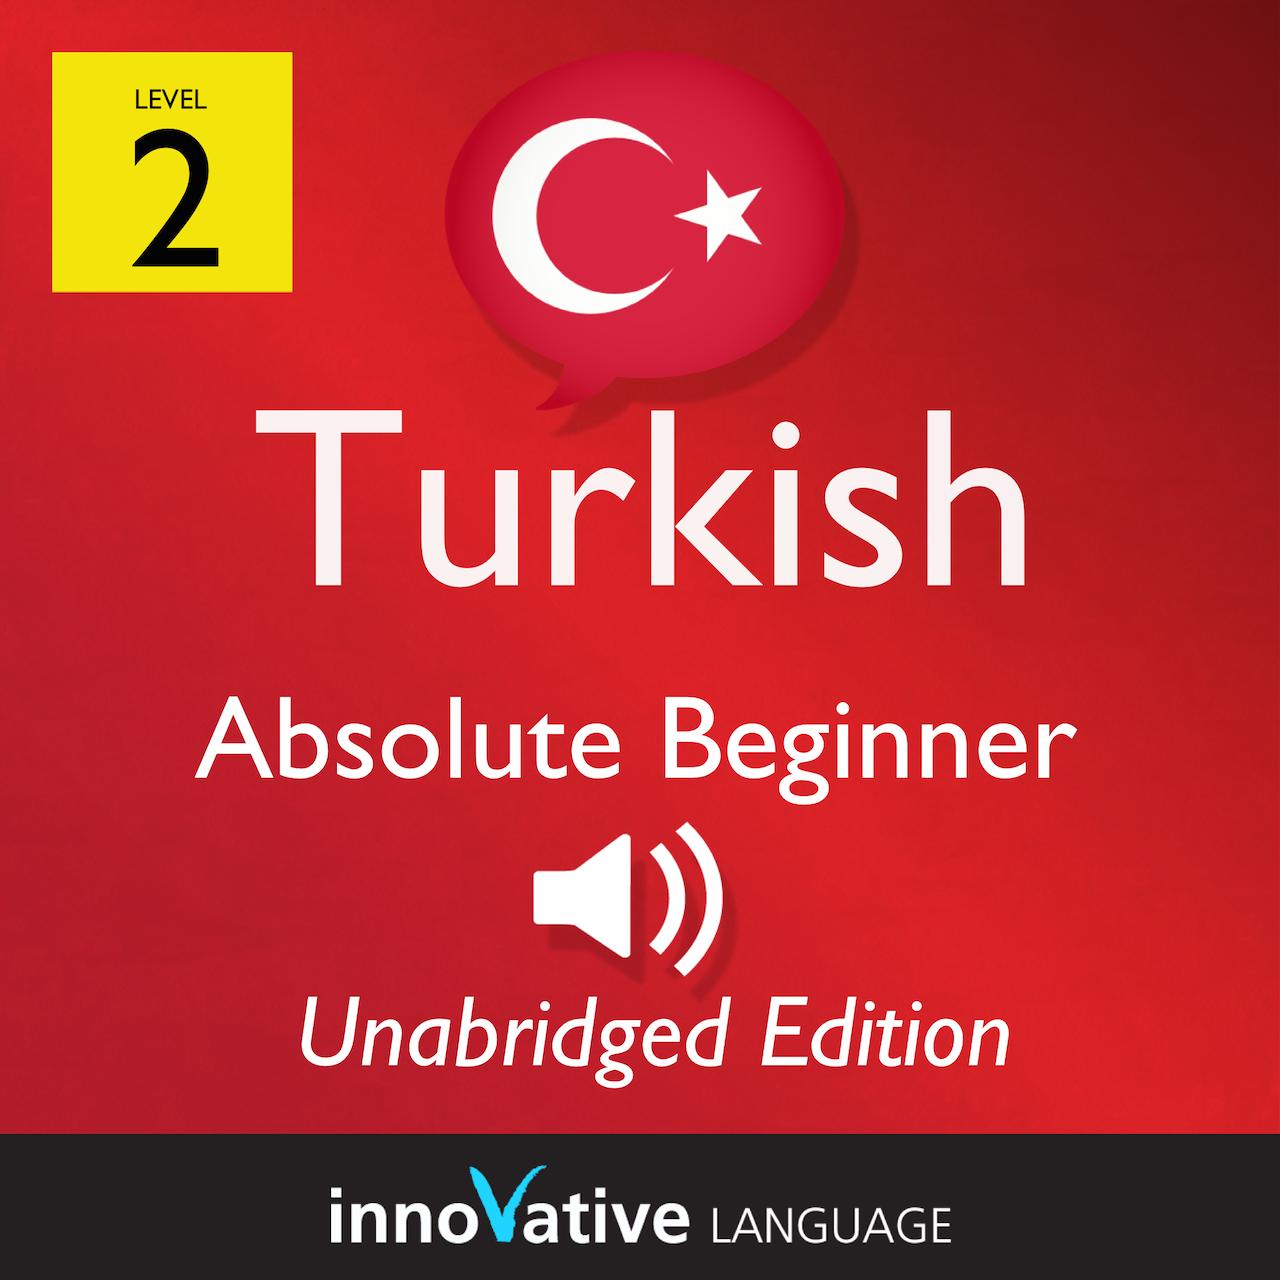 Level Beginner: Level 2: Absolute Beginner Turkish